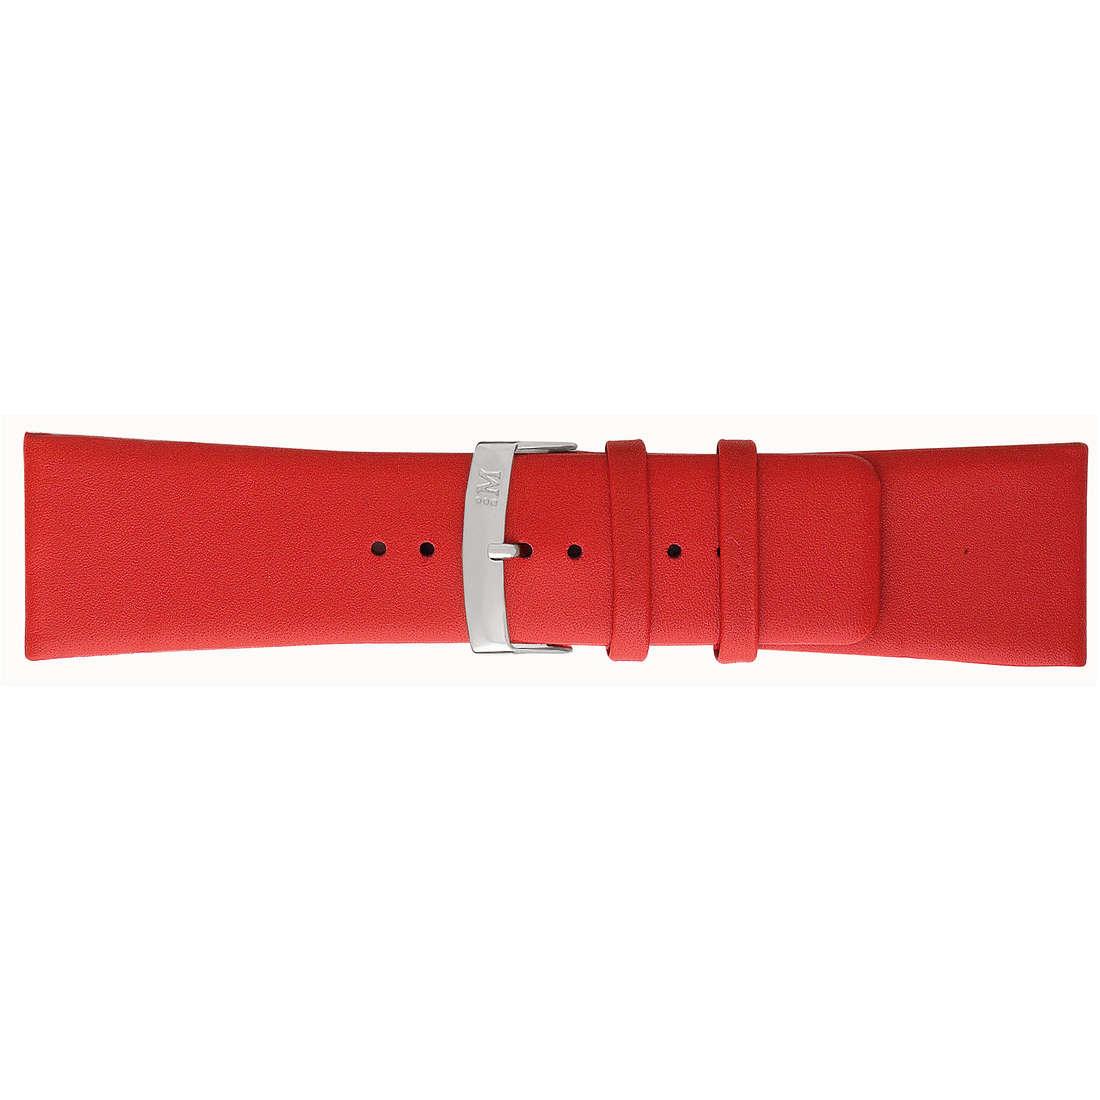 watch watch bands watch straps man Morellato Morellato 1930 A01X3076875083CR24